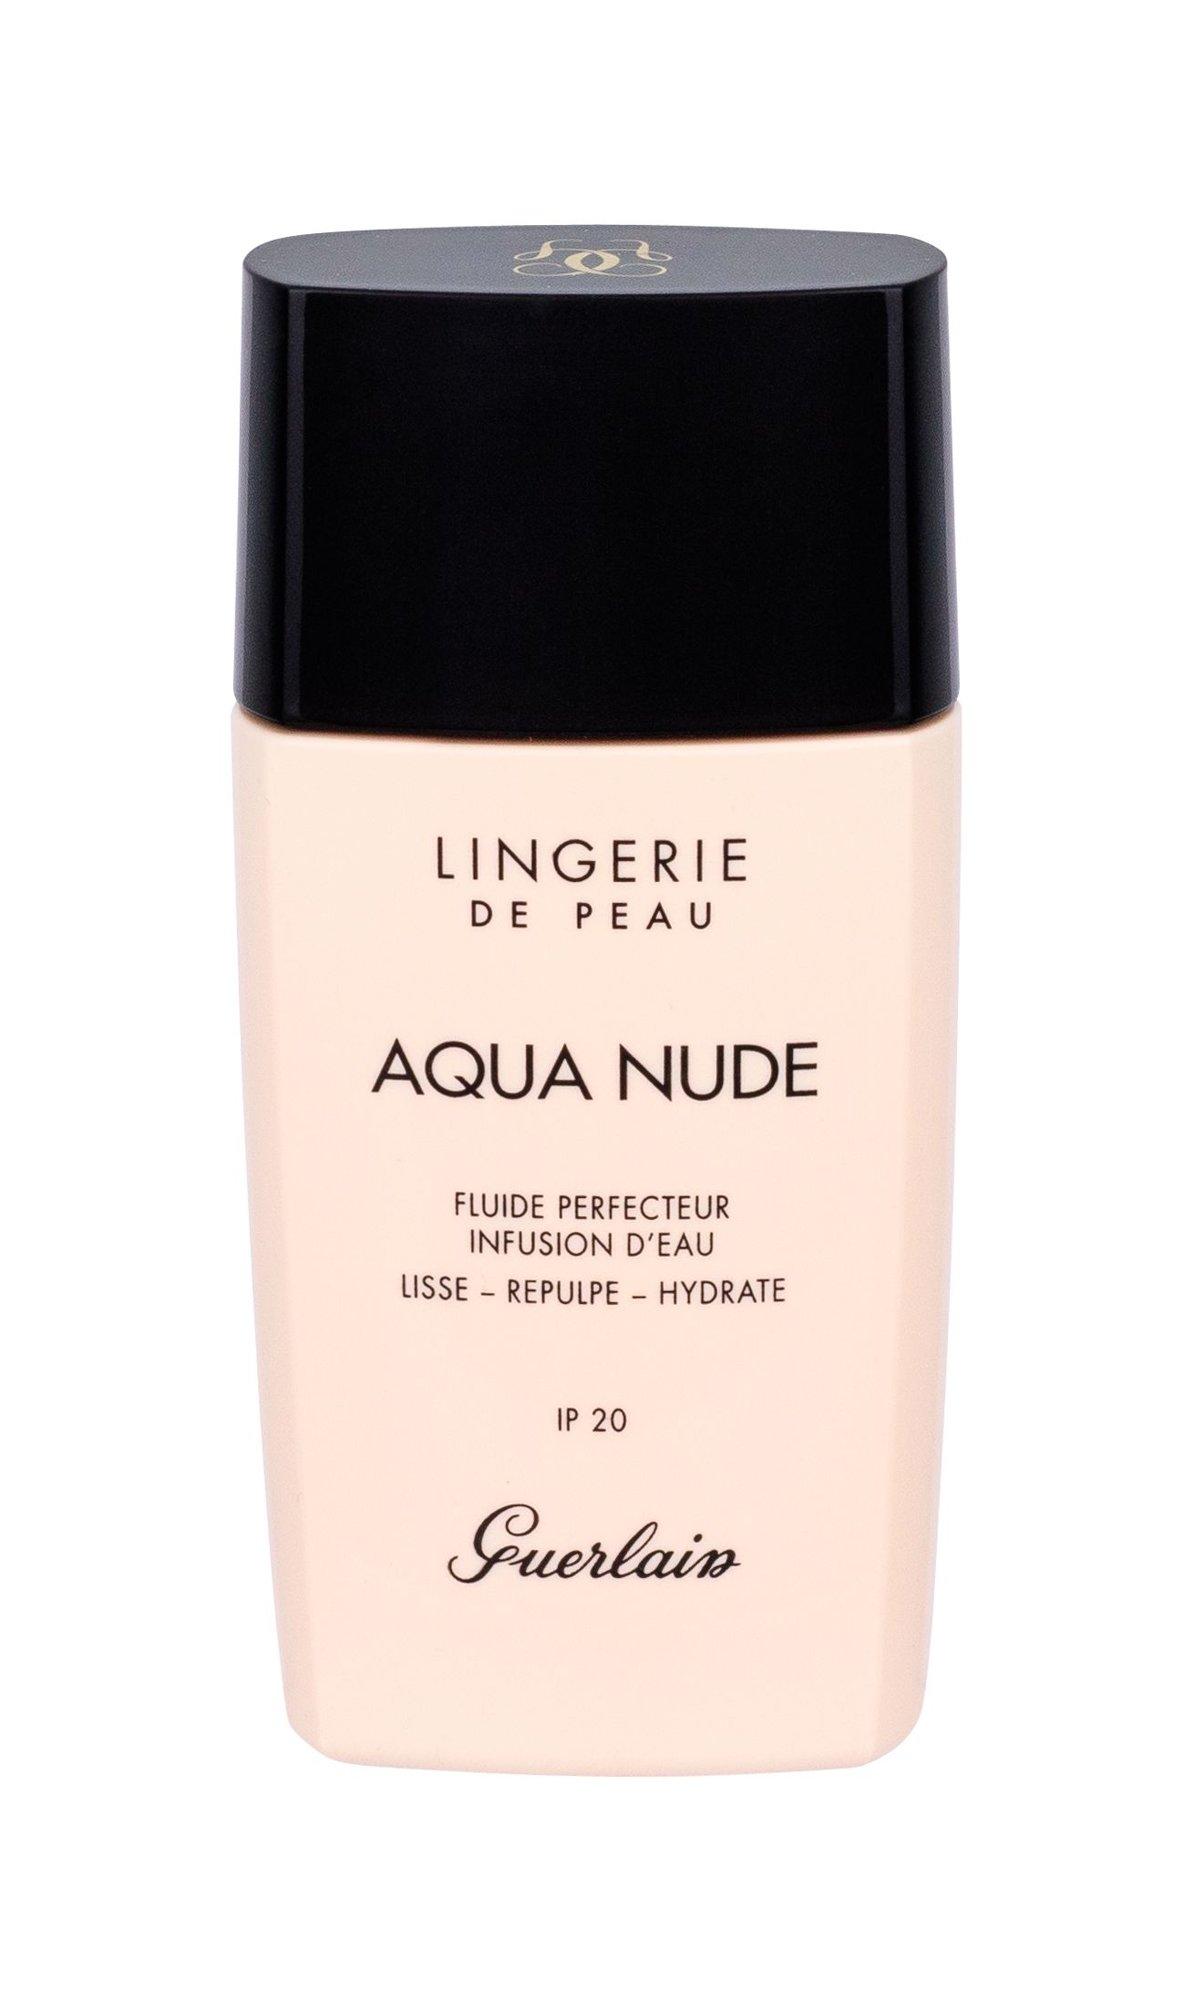 Guerlain Lingerie De Peau Makeup 30ml 02C Light Cool Aqua Nude